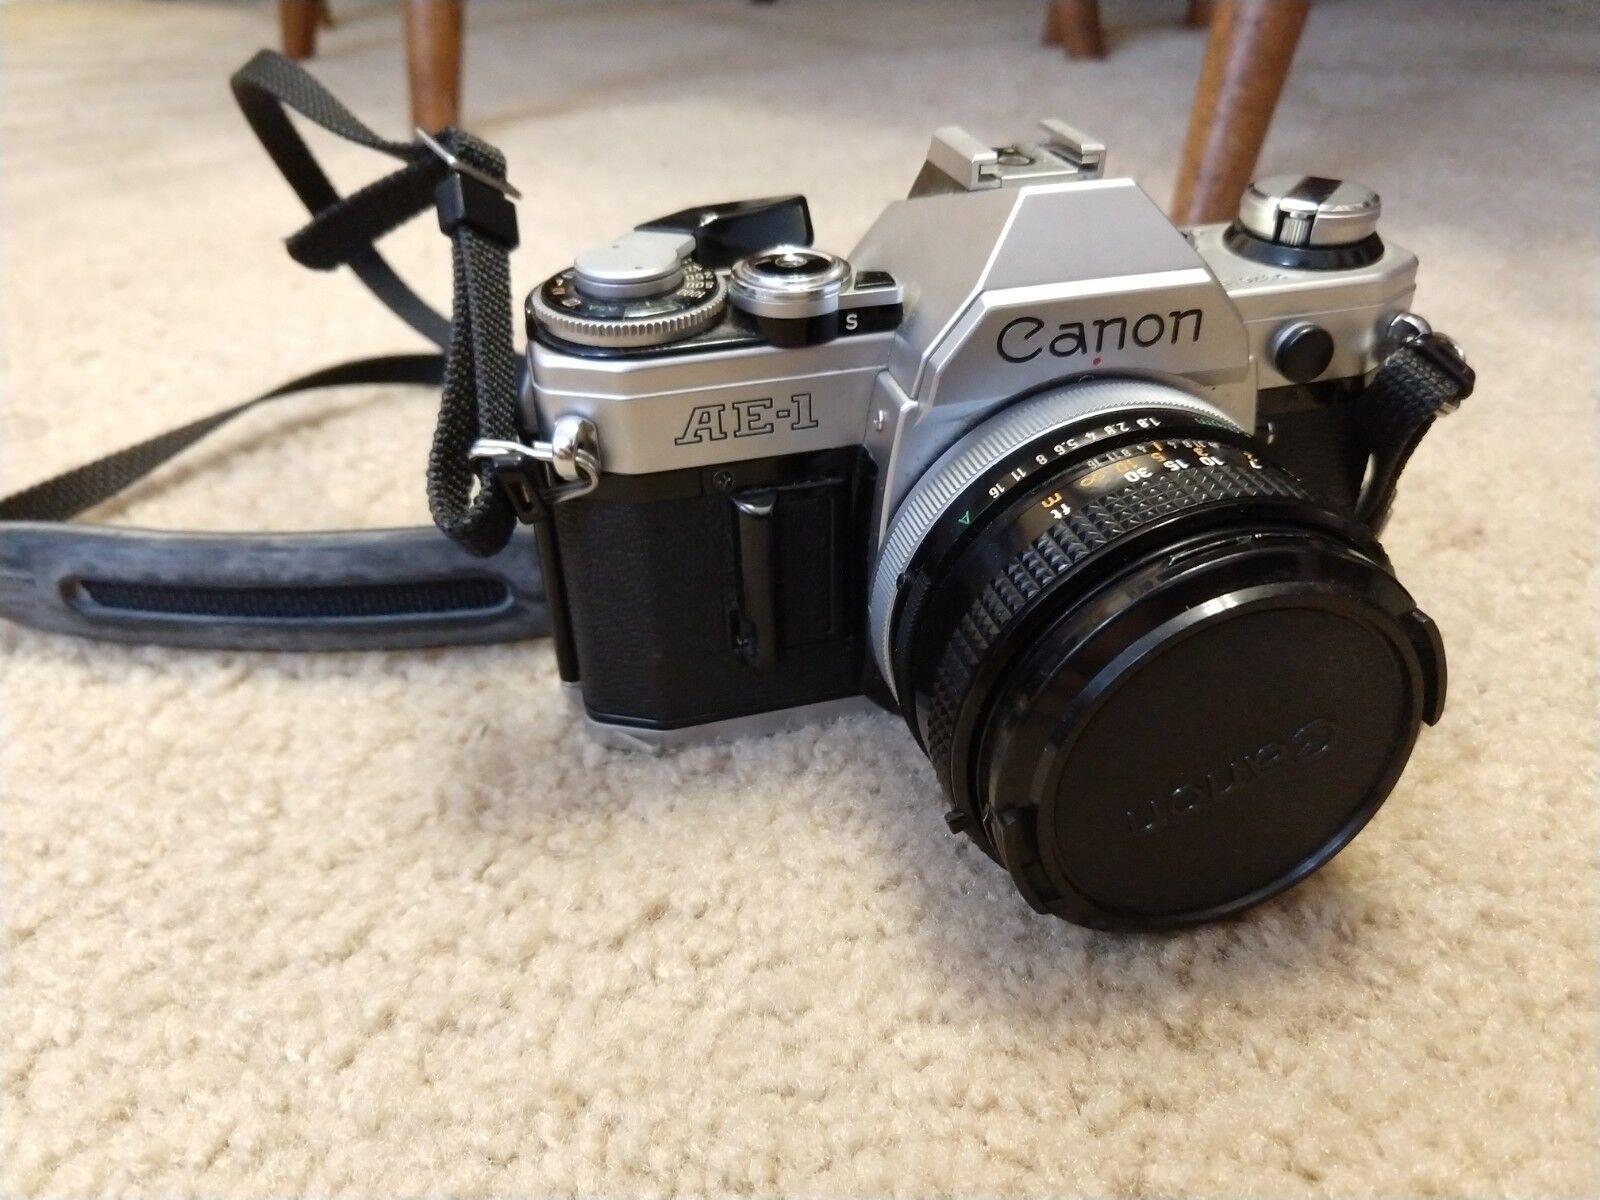 VINTAGE Canon AE-1 Program 35mm Film Manual Camera w/ 50mm F1.8 Lens